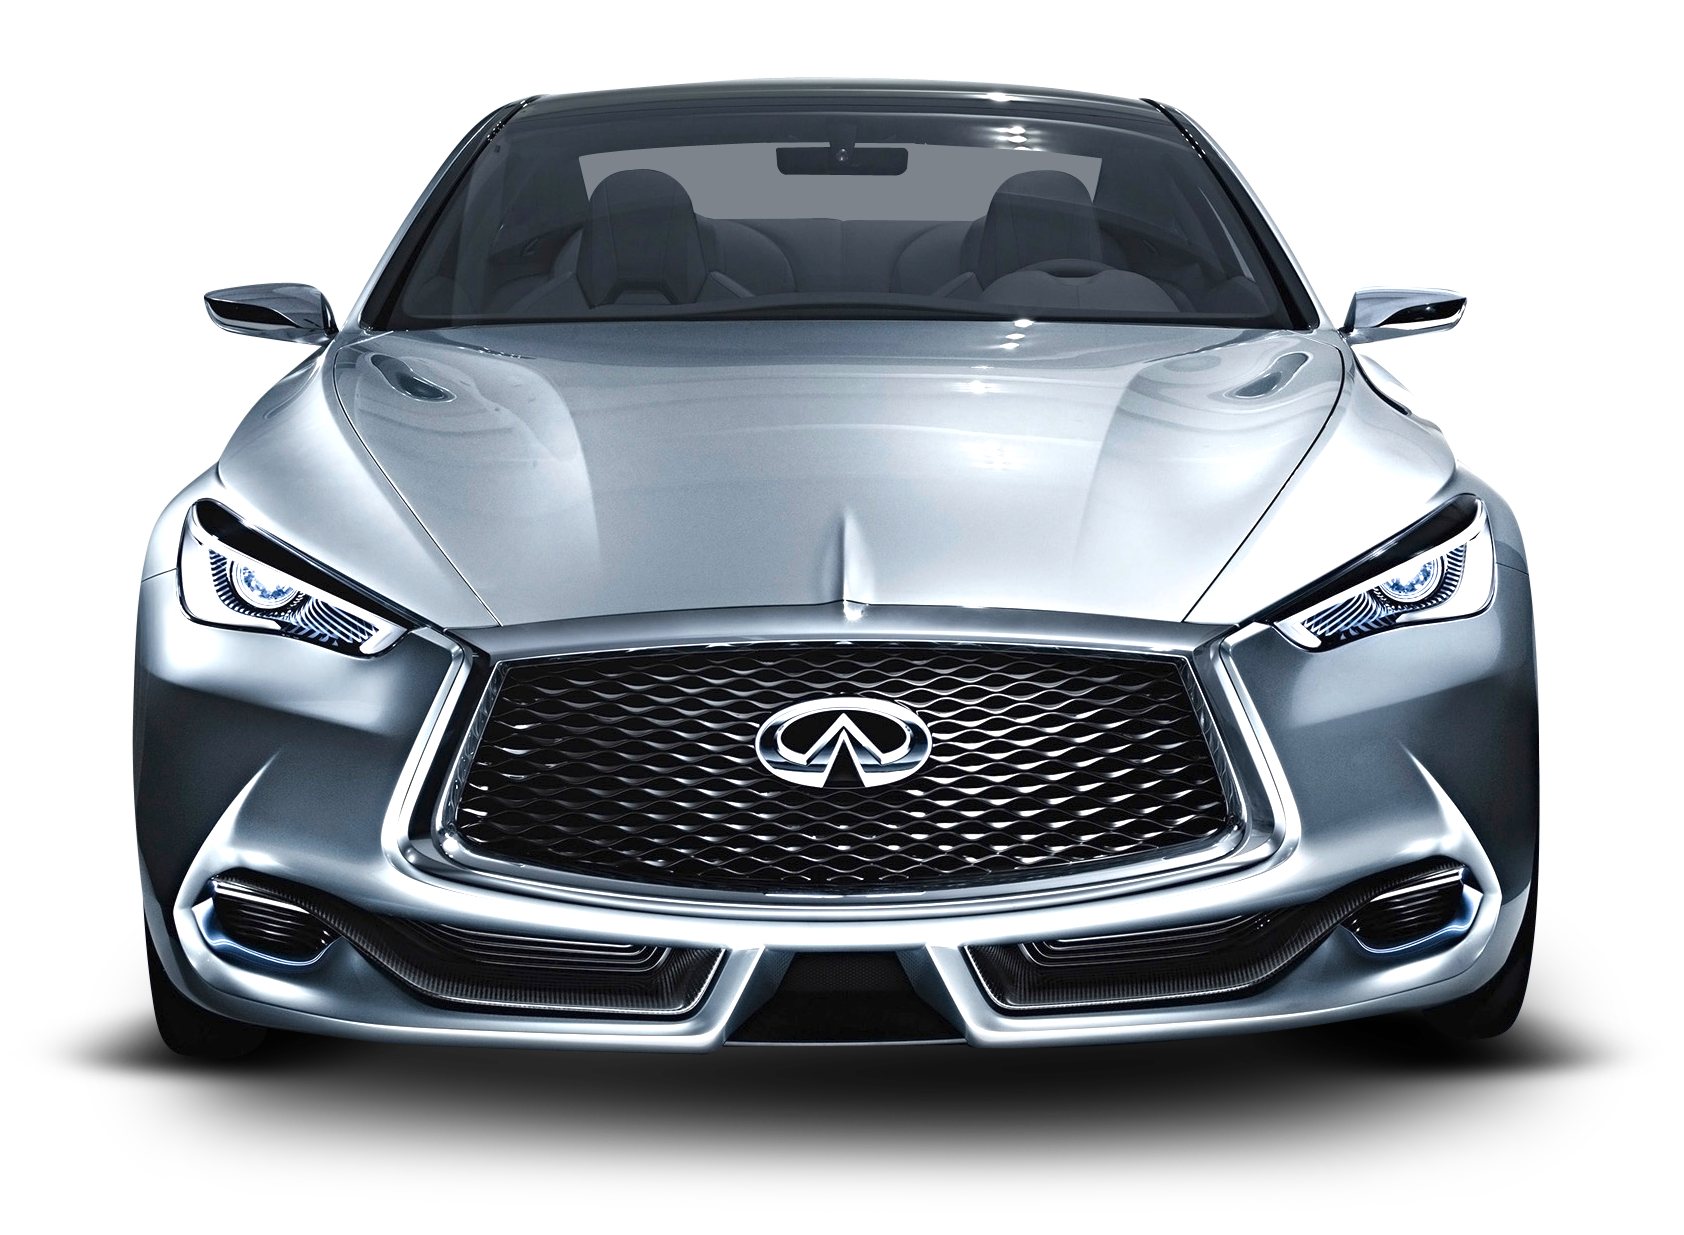 Infiniti Q60 Car Silver Png Image Luxury Cars Infiniti Car